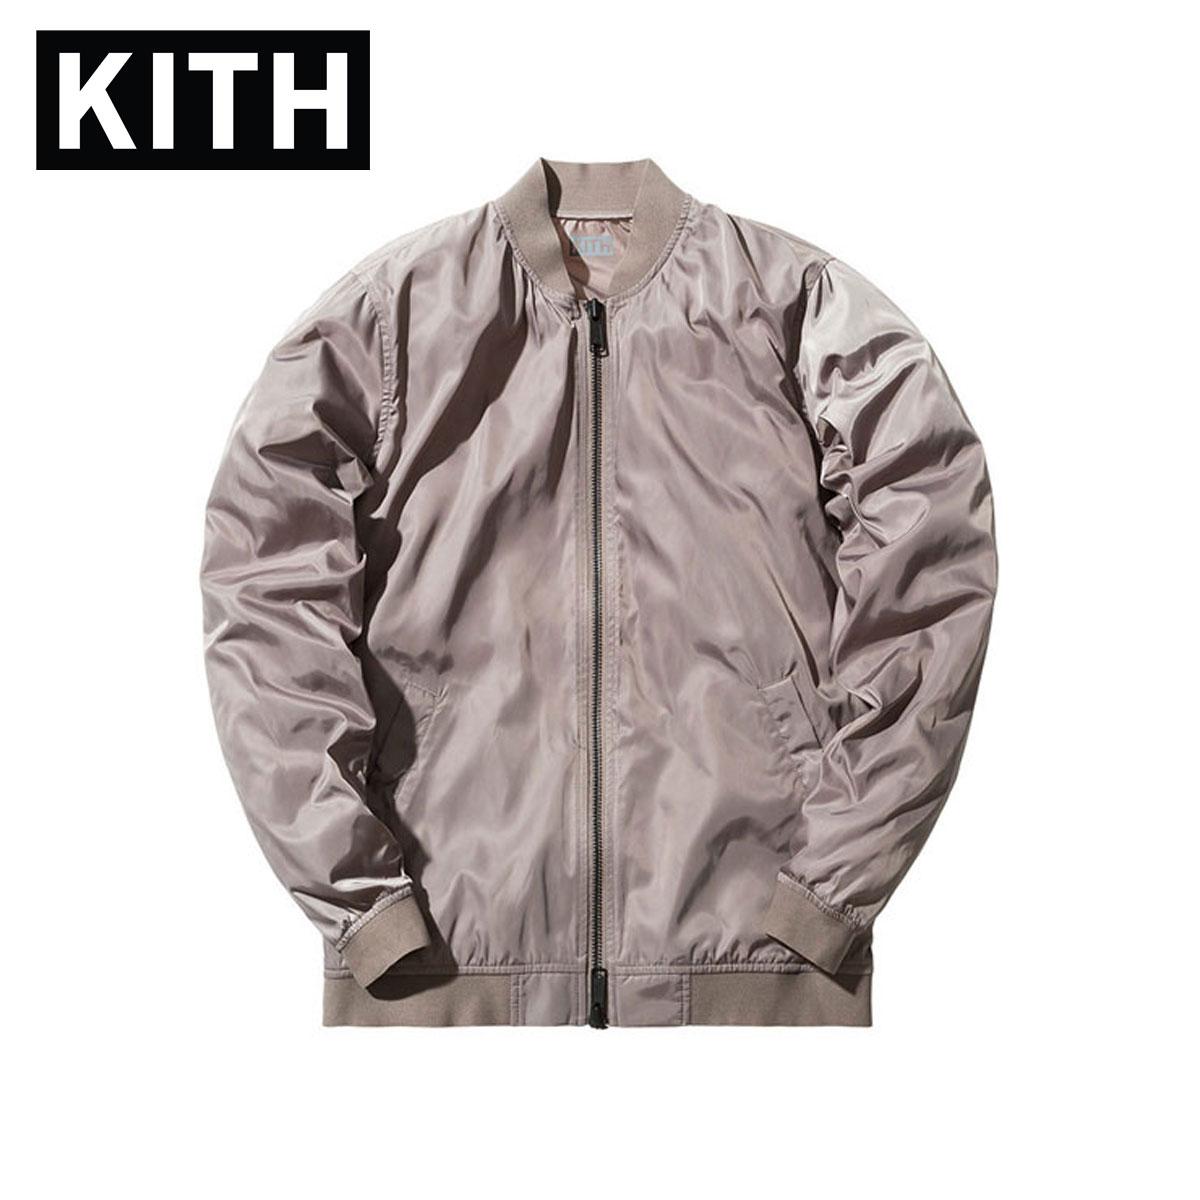 6df7fe51a Kiss KITH regular article men jacket Kith Astor Shell MA-1 - Cinder D00S15